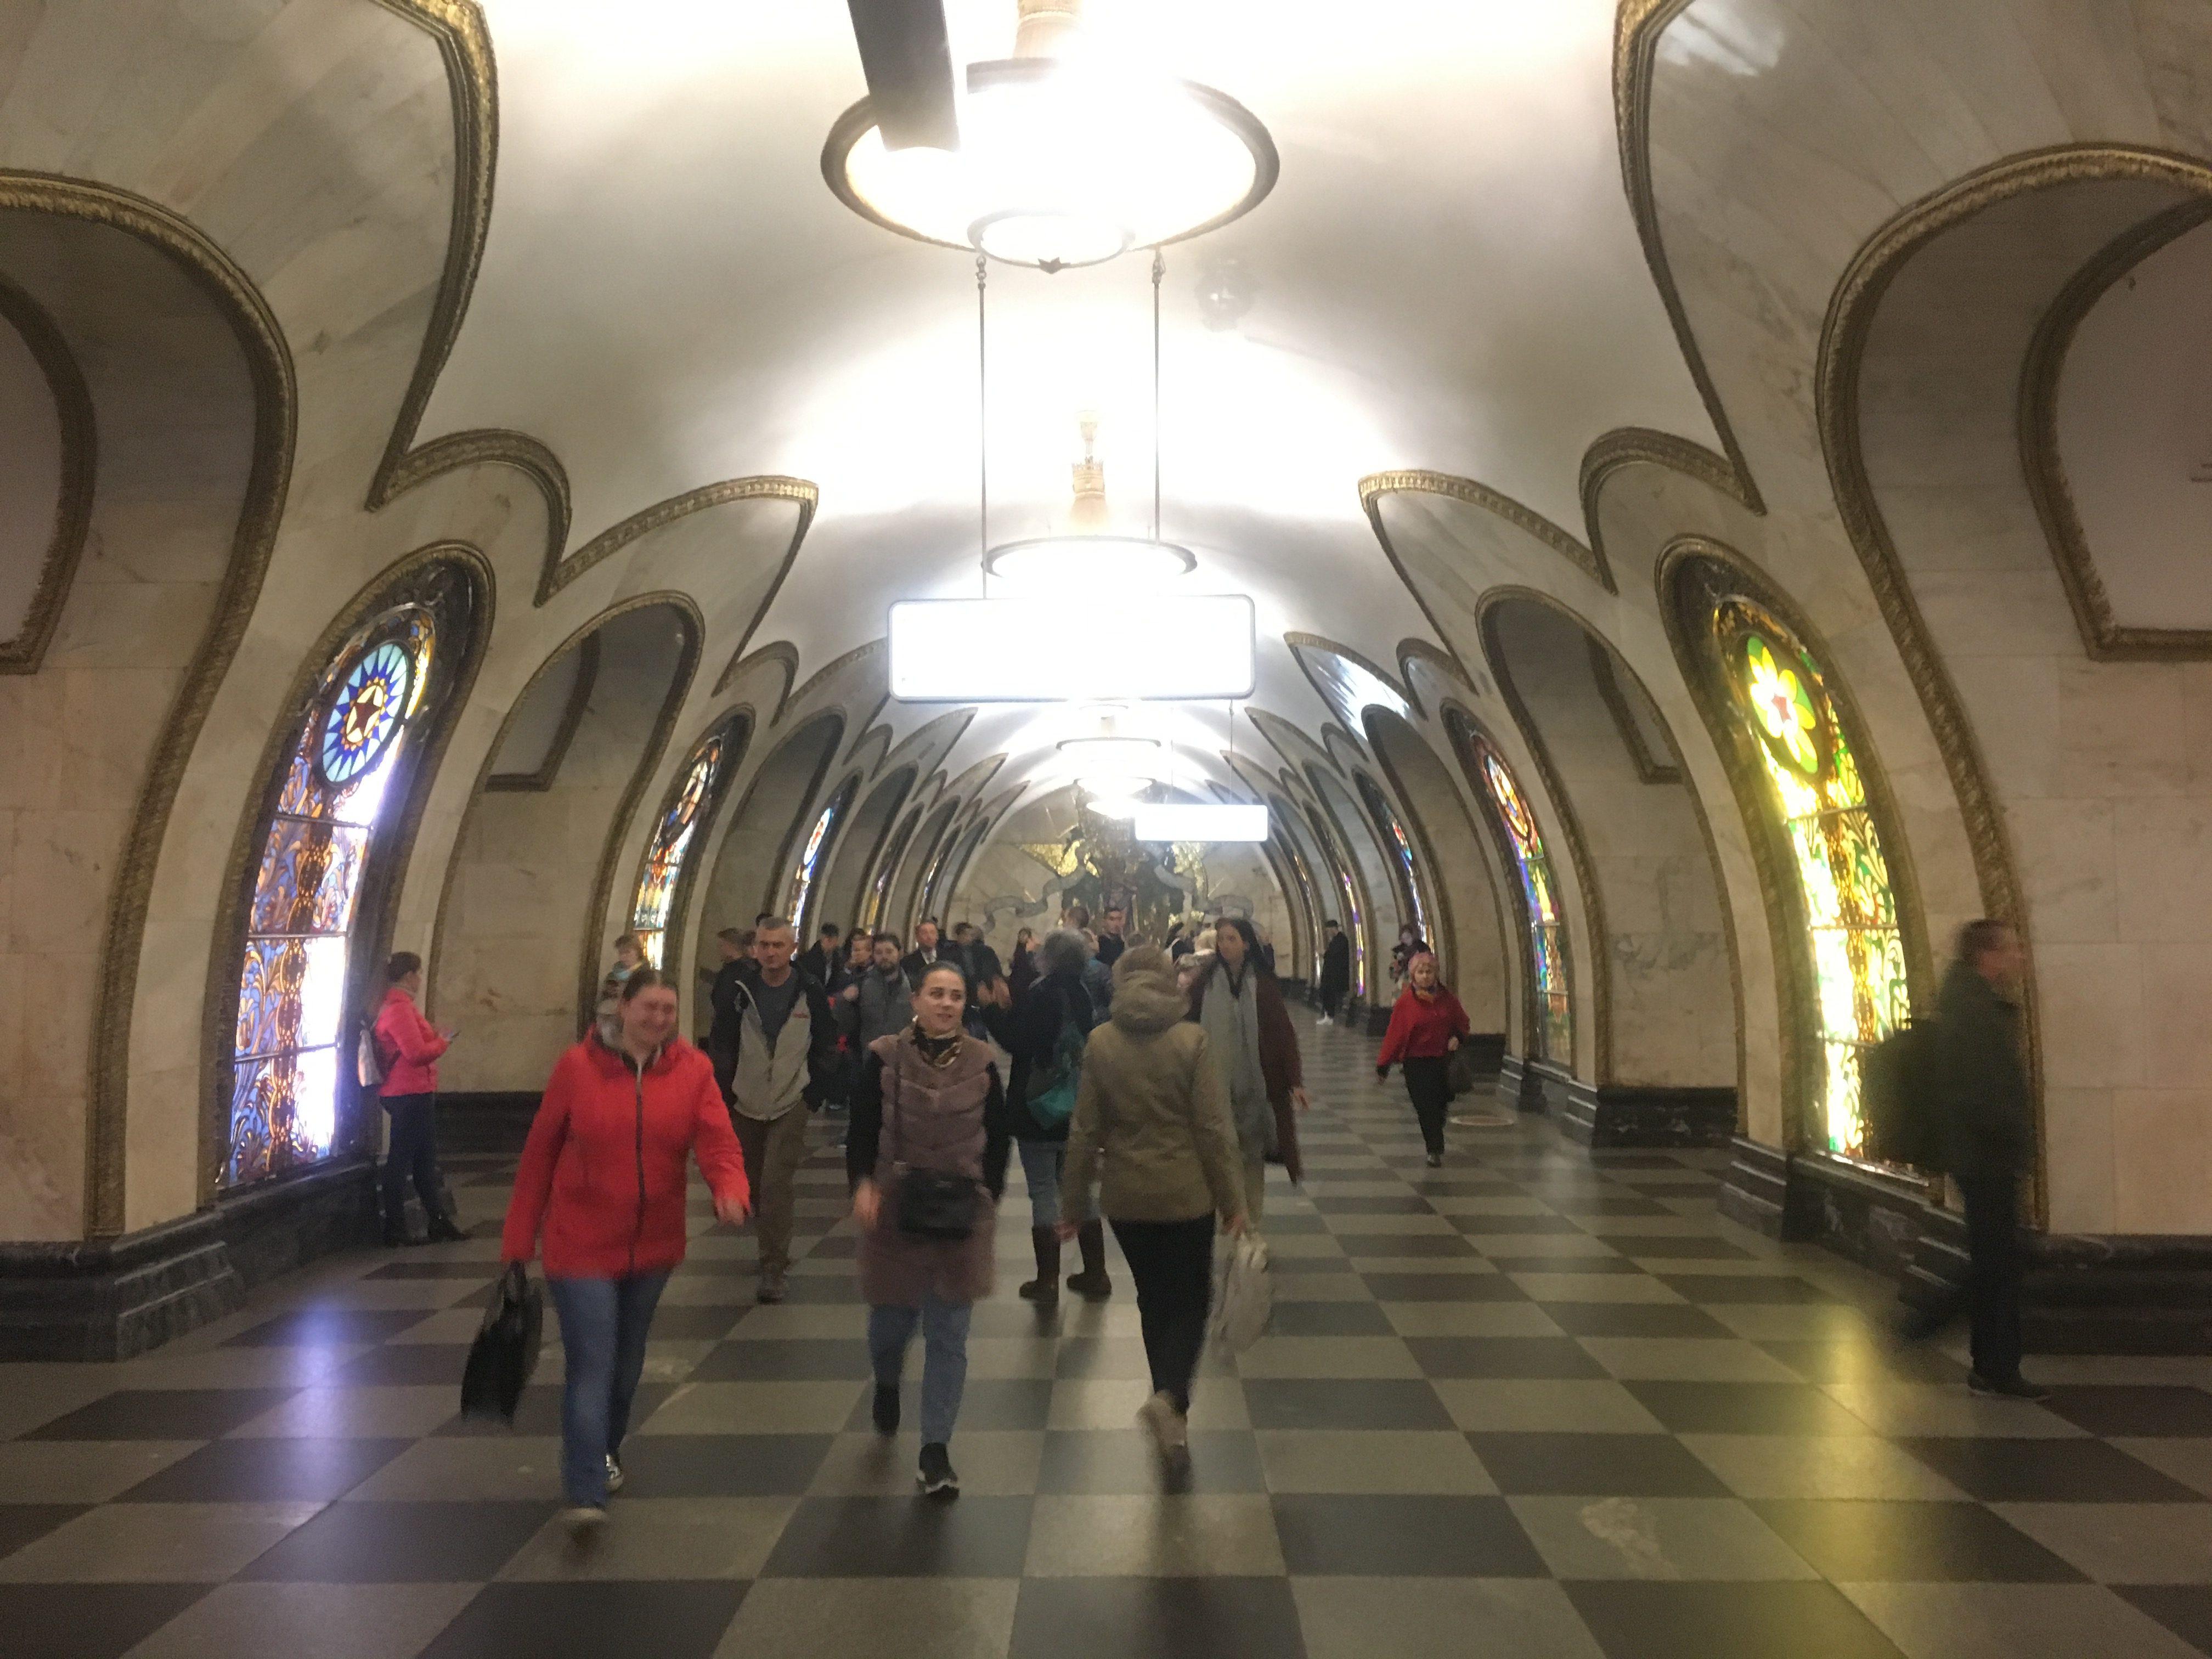 Novoslobodskaya Station's windows feature life and creation